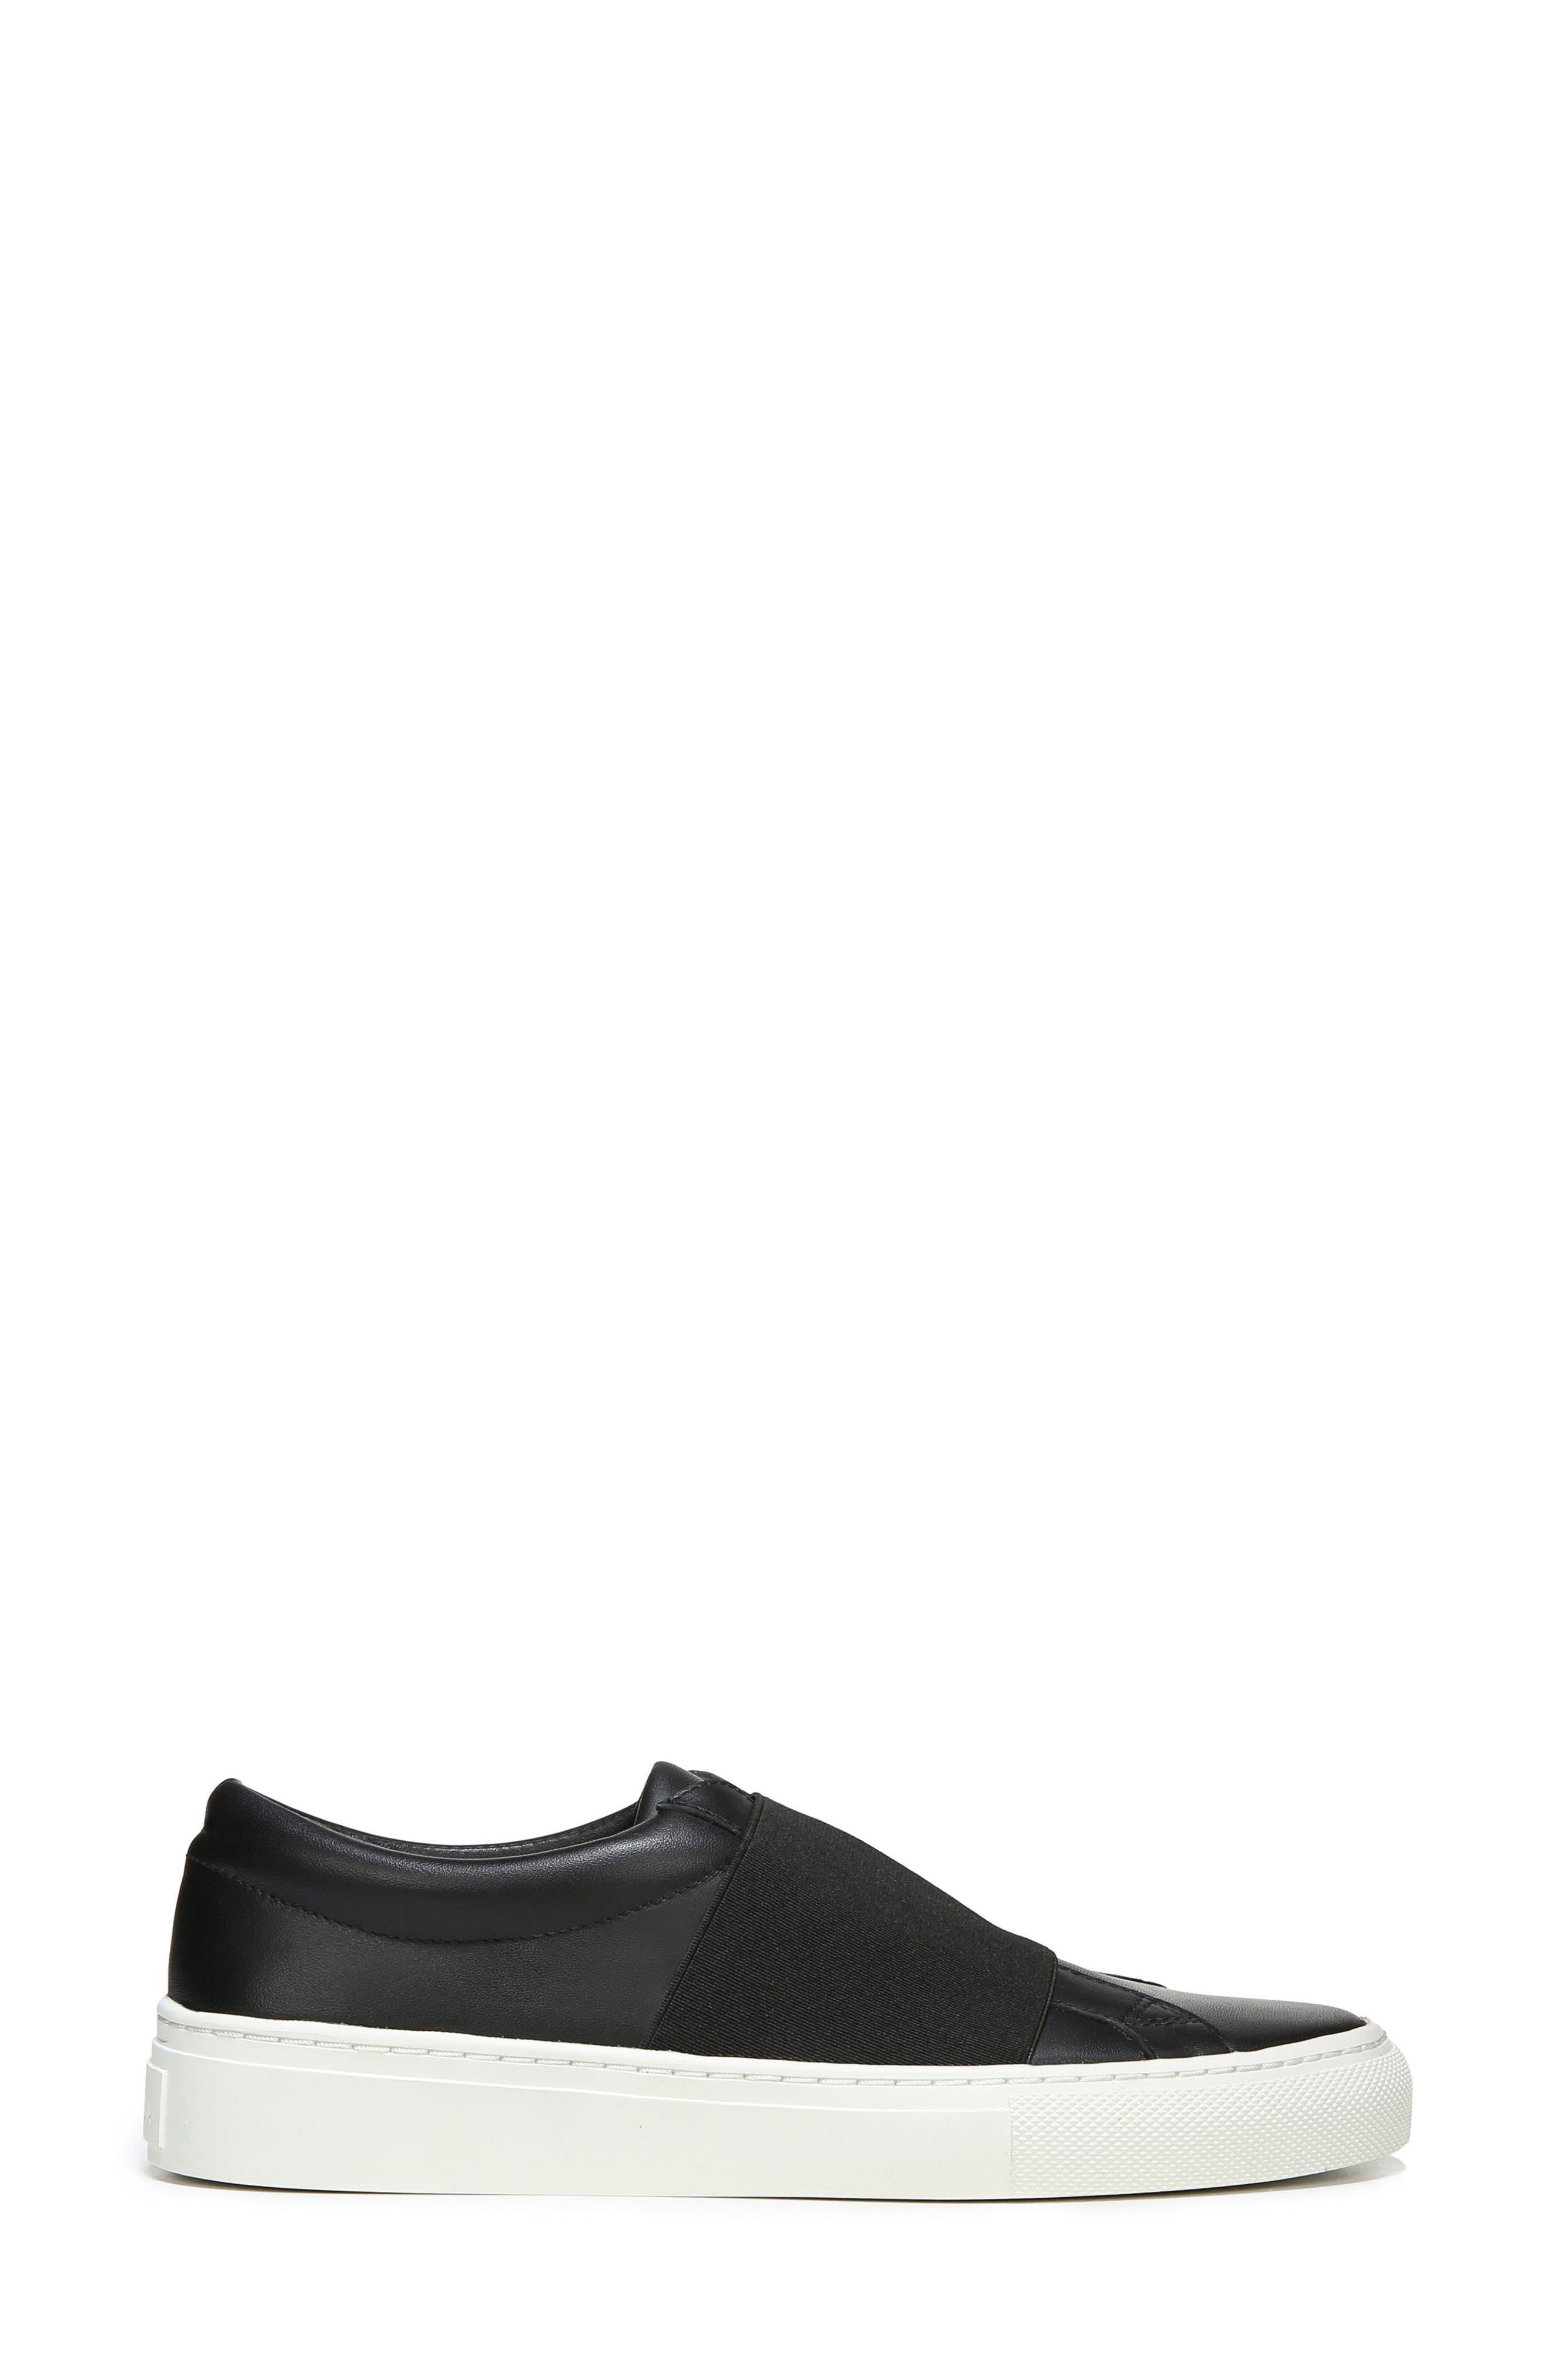 Saran Slip-On Sneaker,                             Alternate thumbnail 3, color,                             Black/ Black Leather